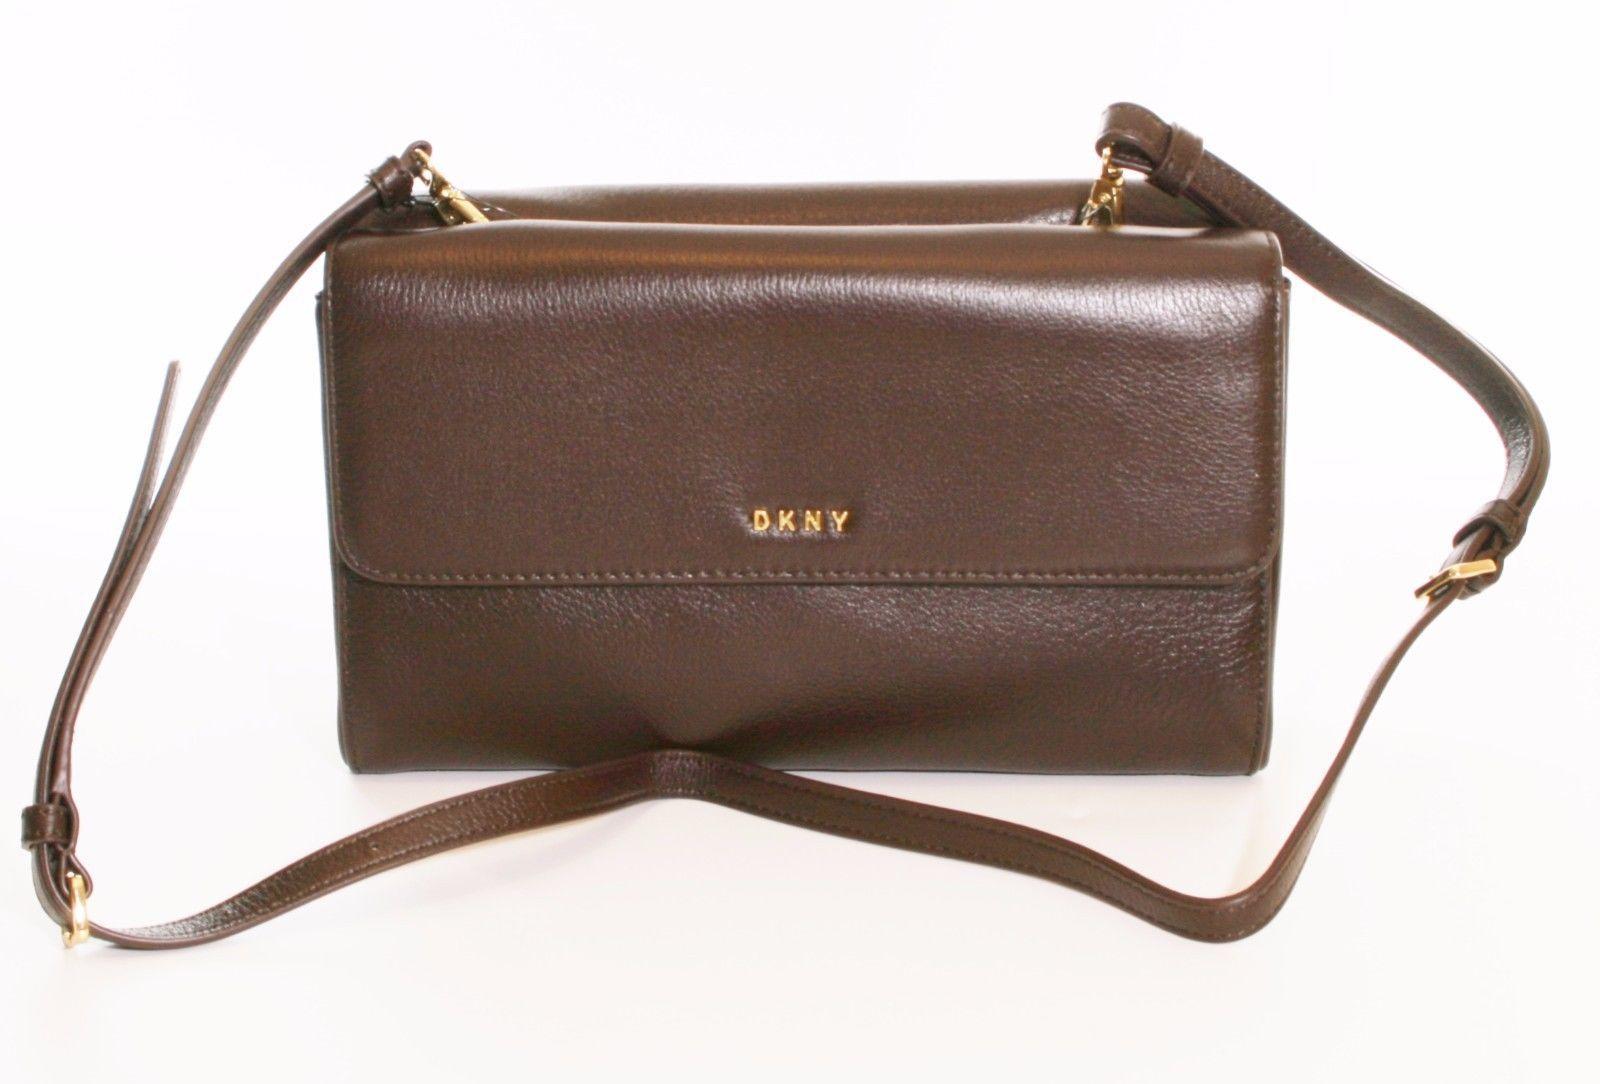 DKNY Donna Karan Dark Brown Leather Double Flap Shoulder Bag Clutch RRP £215 - $199.00